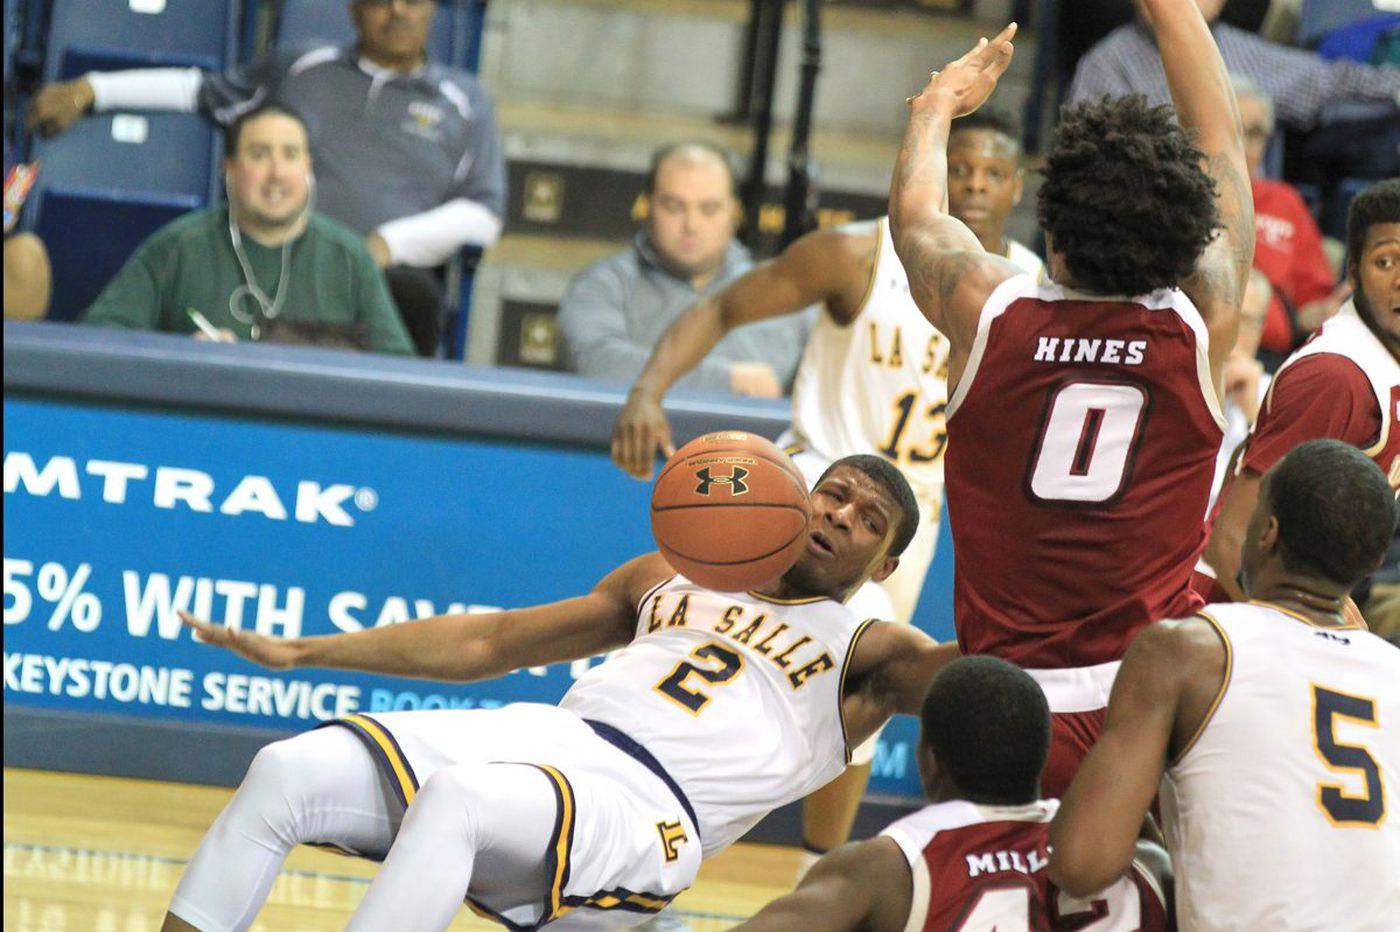 Amar Stukes ties career high in points as La Salle tops Massachusetts